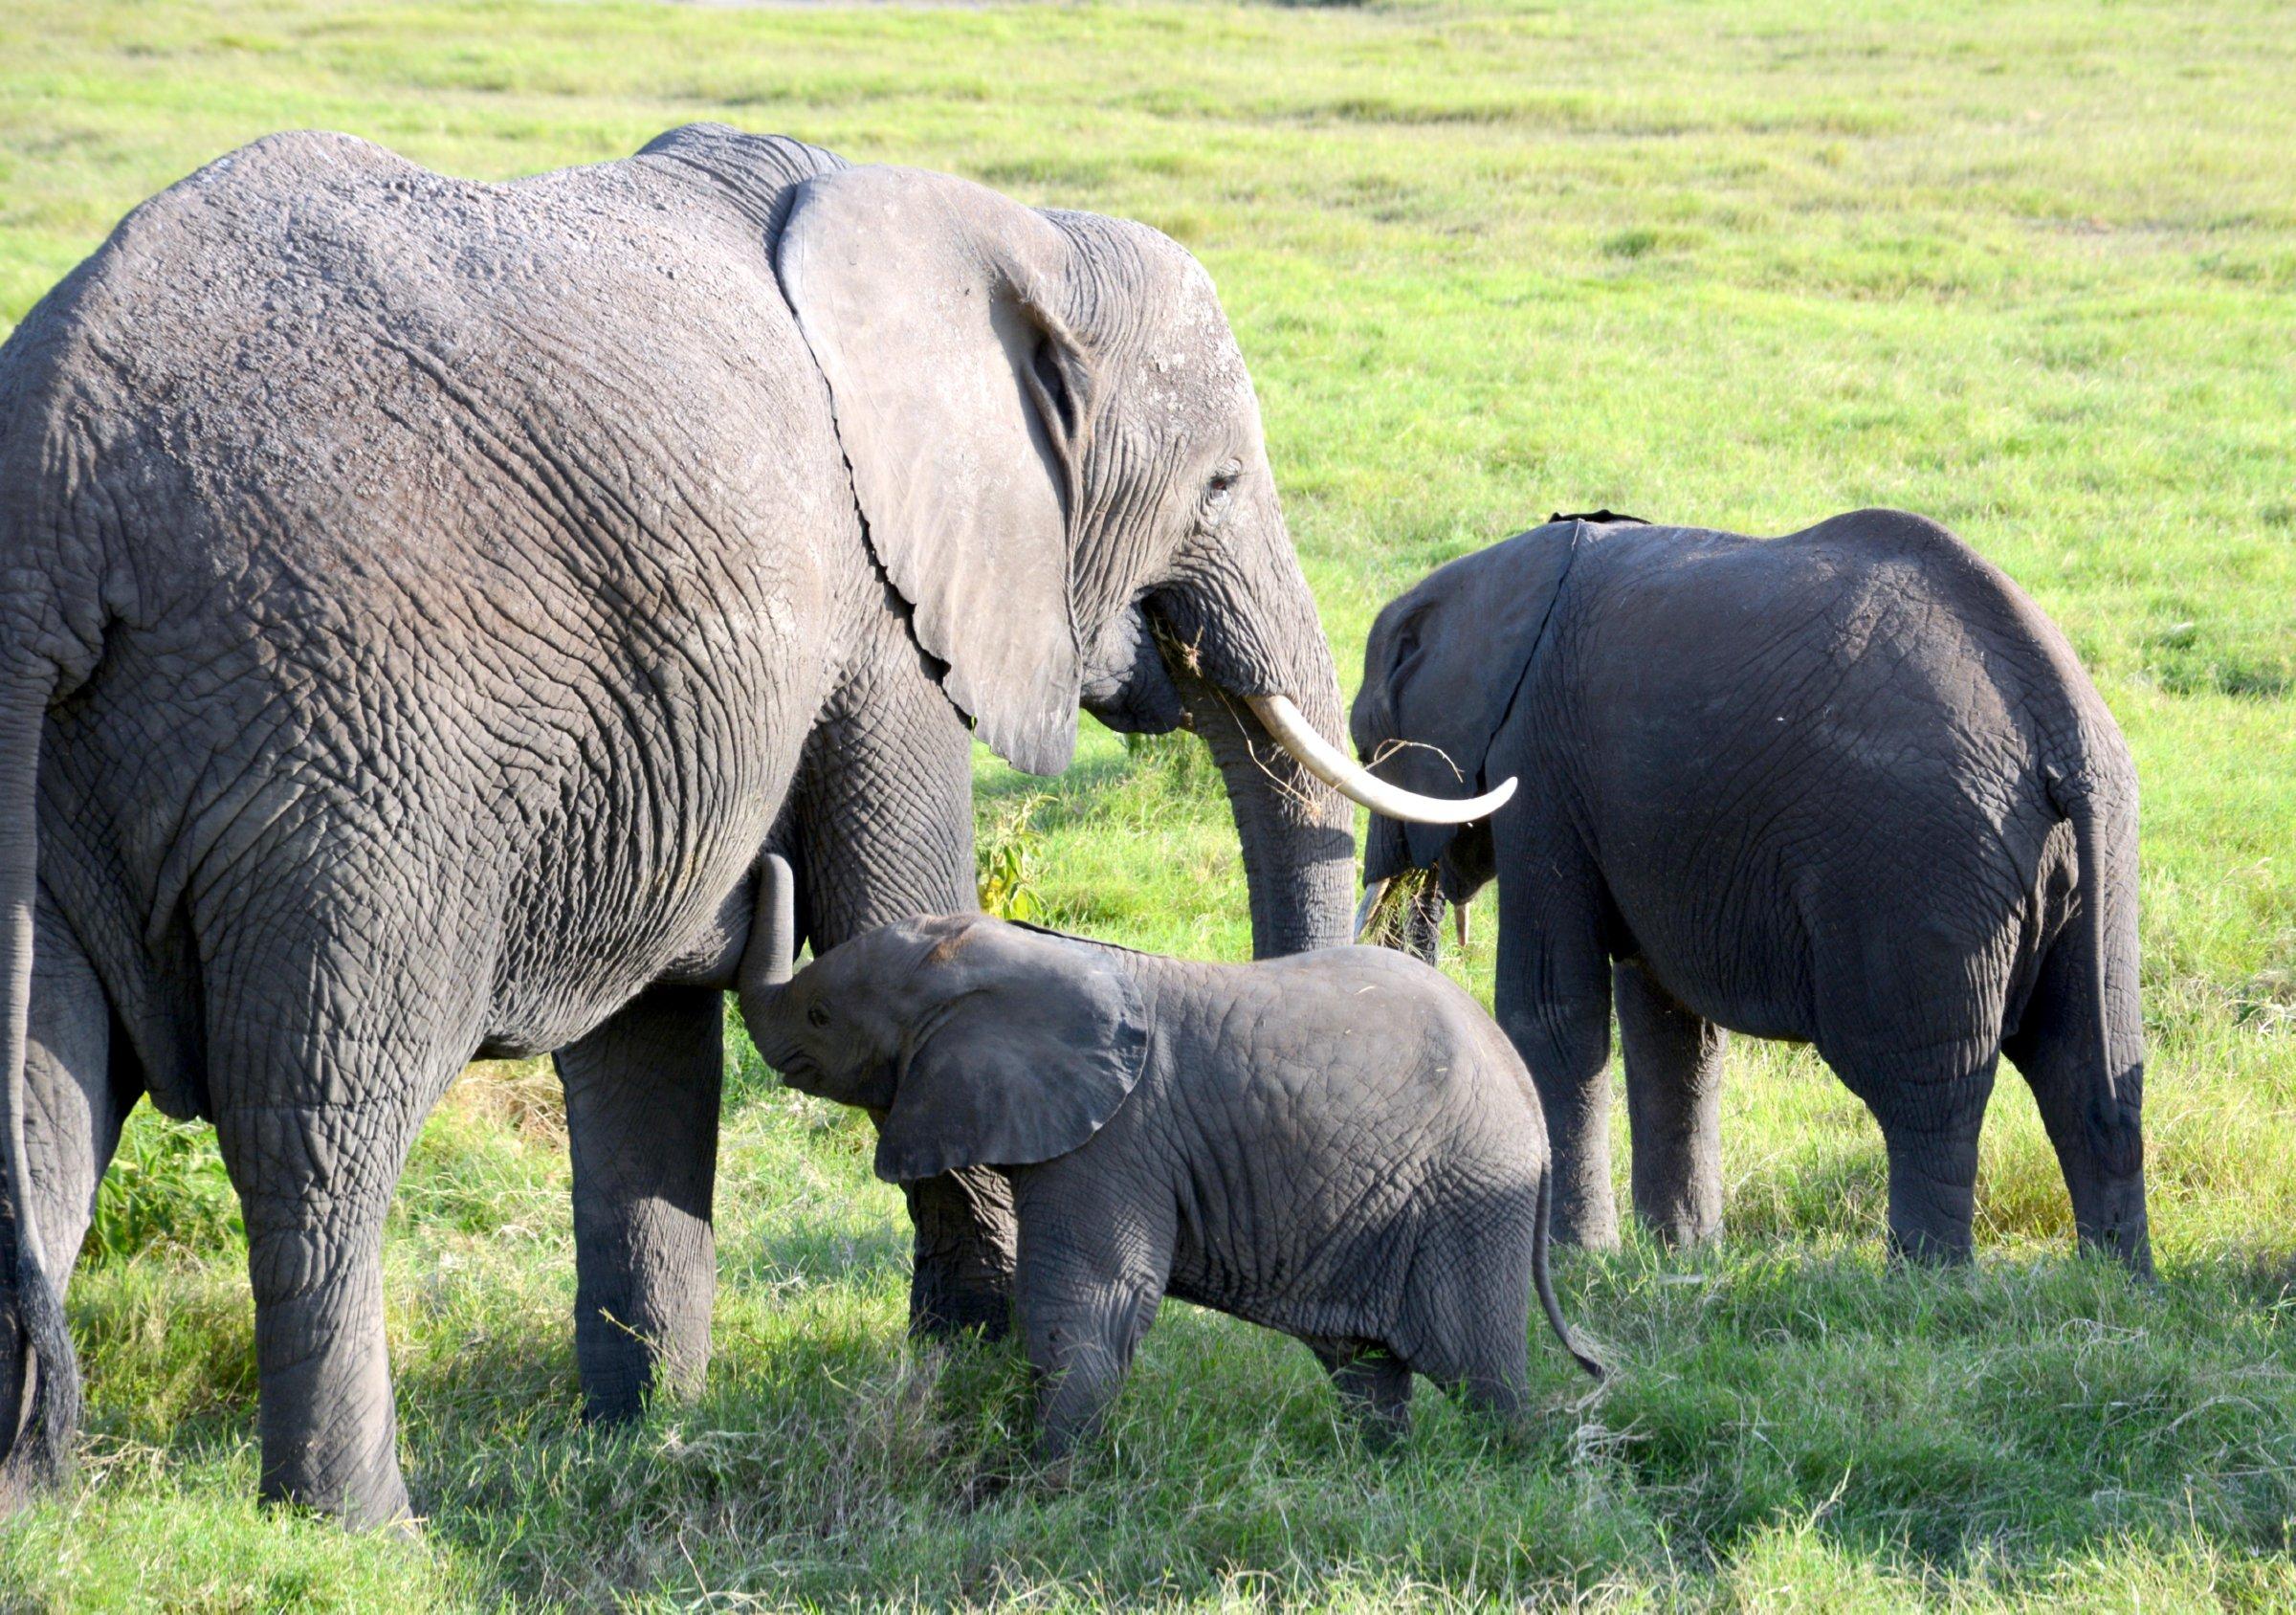 Young elephant nursing (Photo: Shasta Bray)